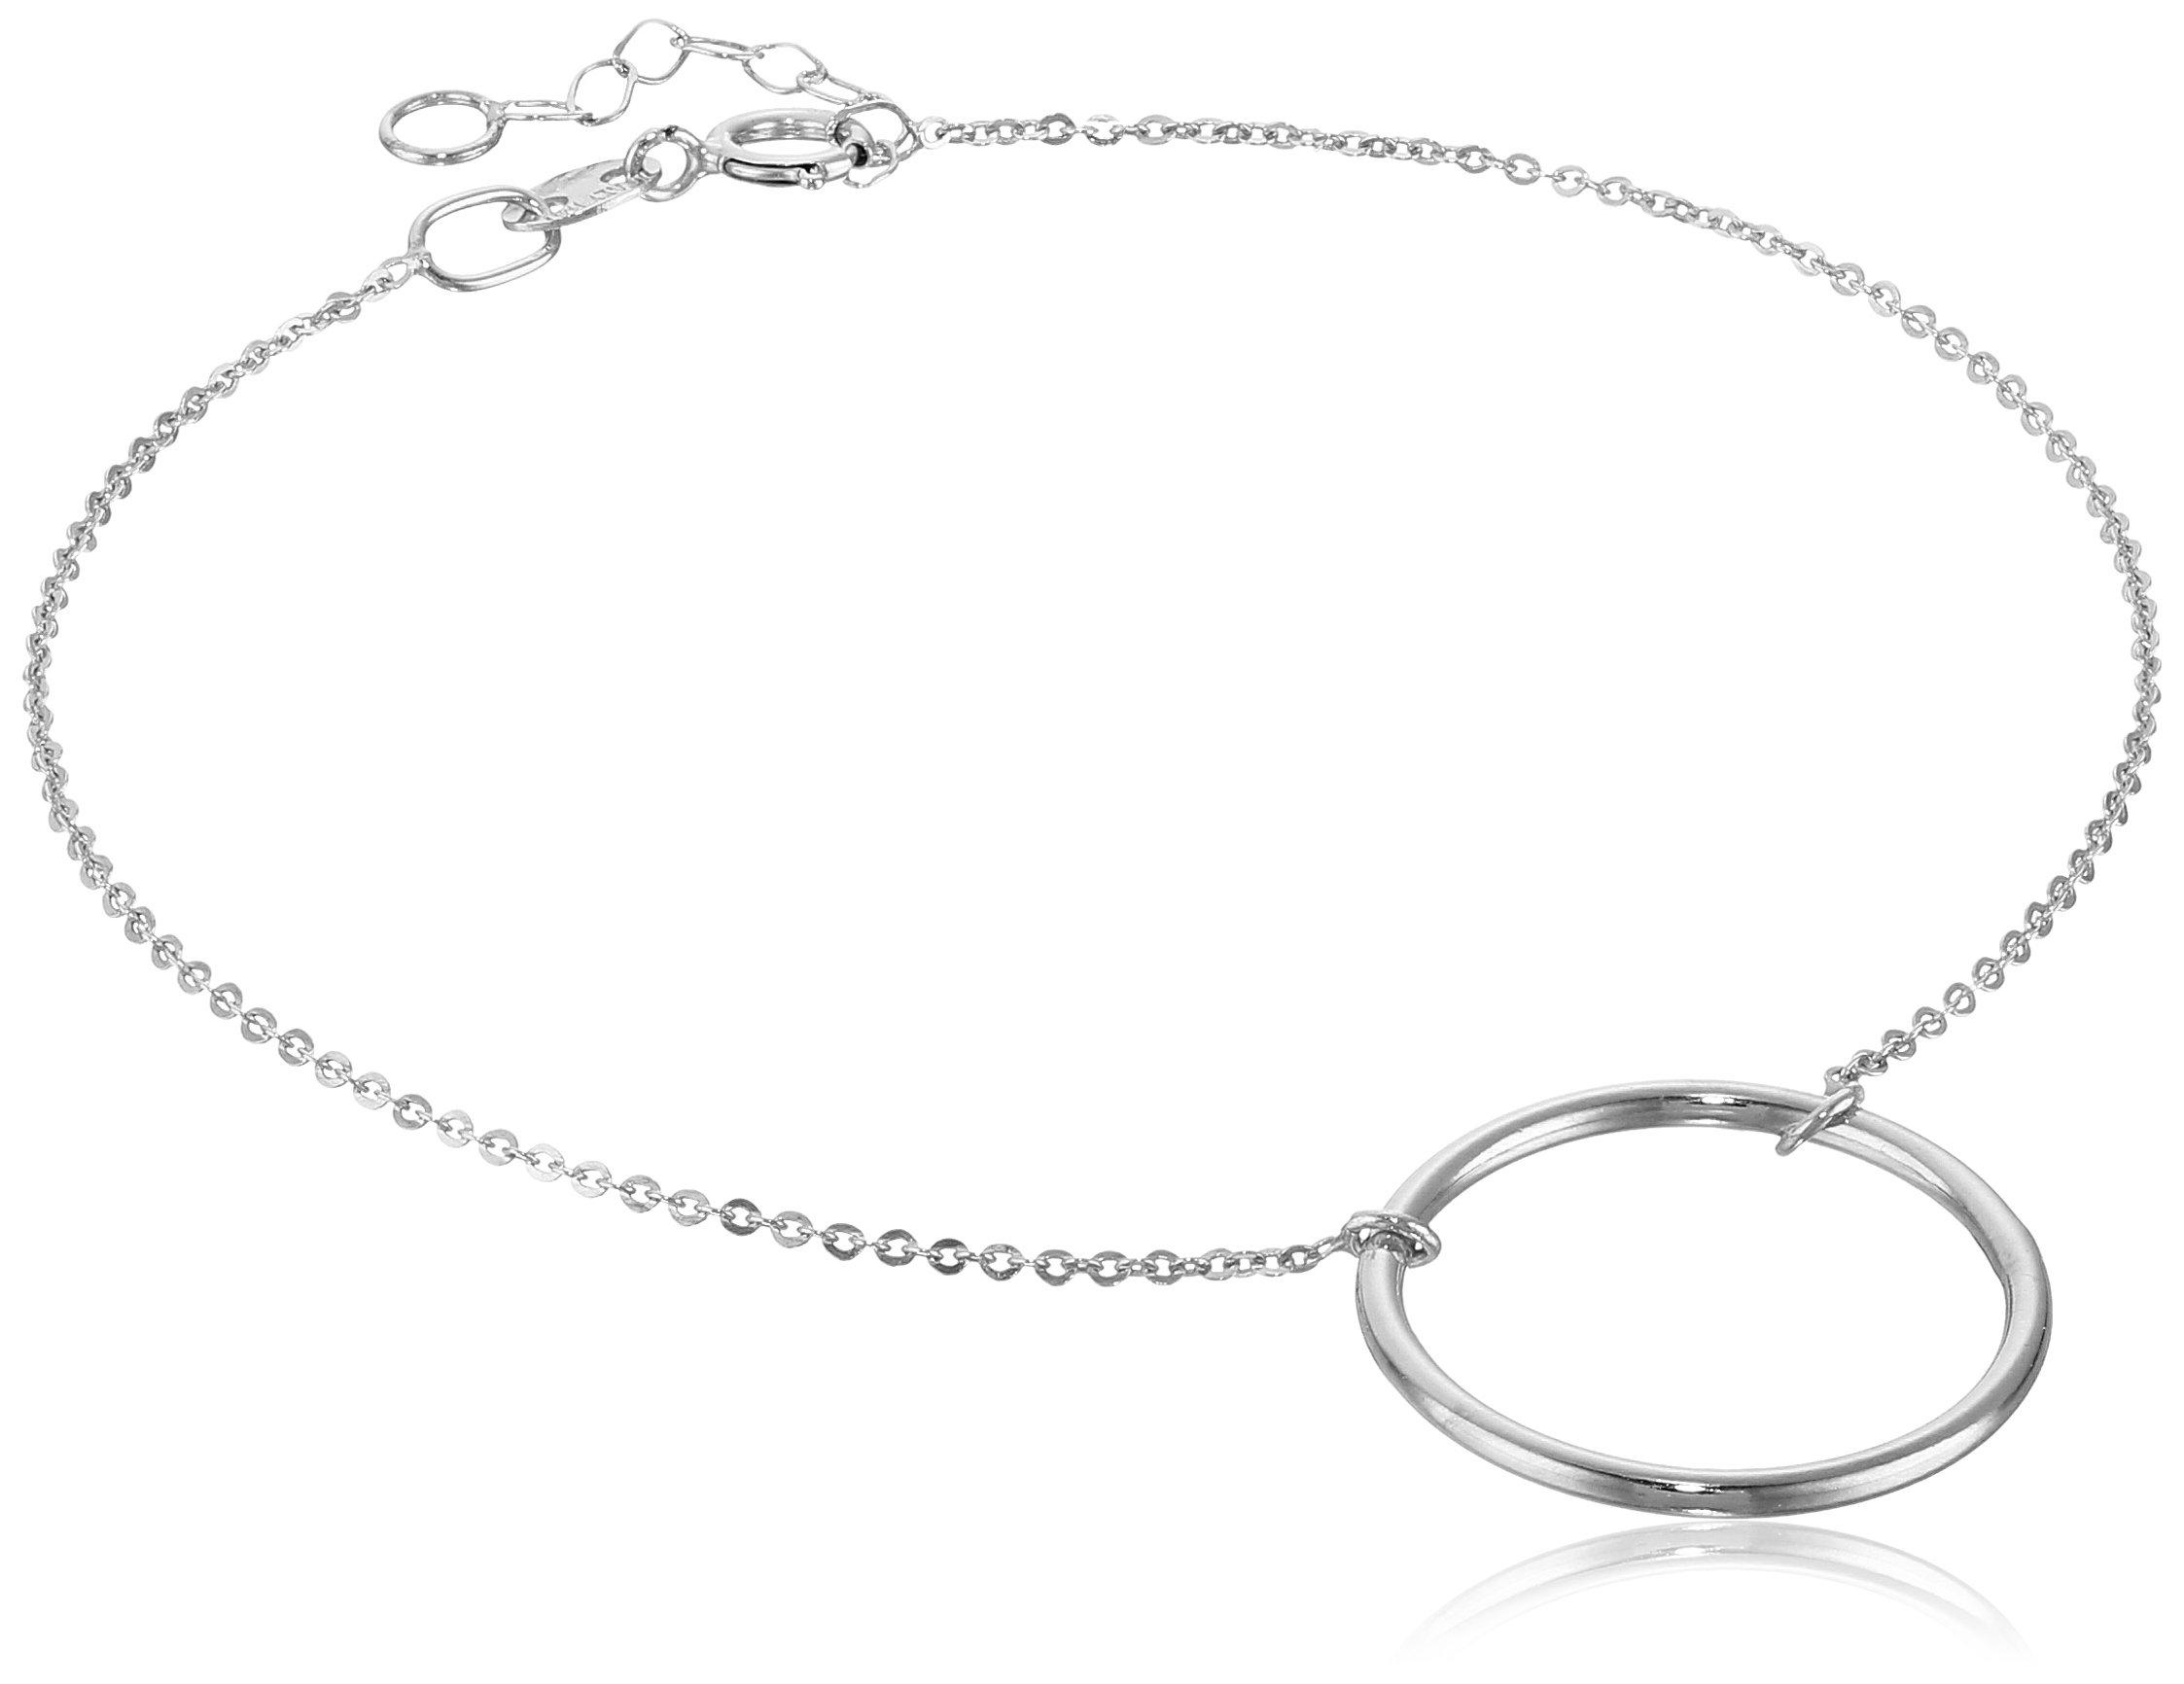 14k Italian White Gold Circle Adjustable Link Bracelet